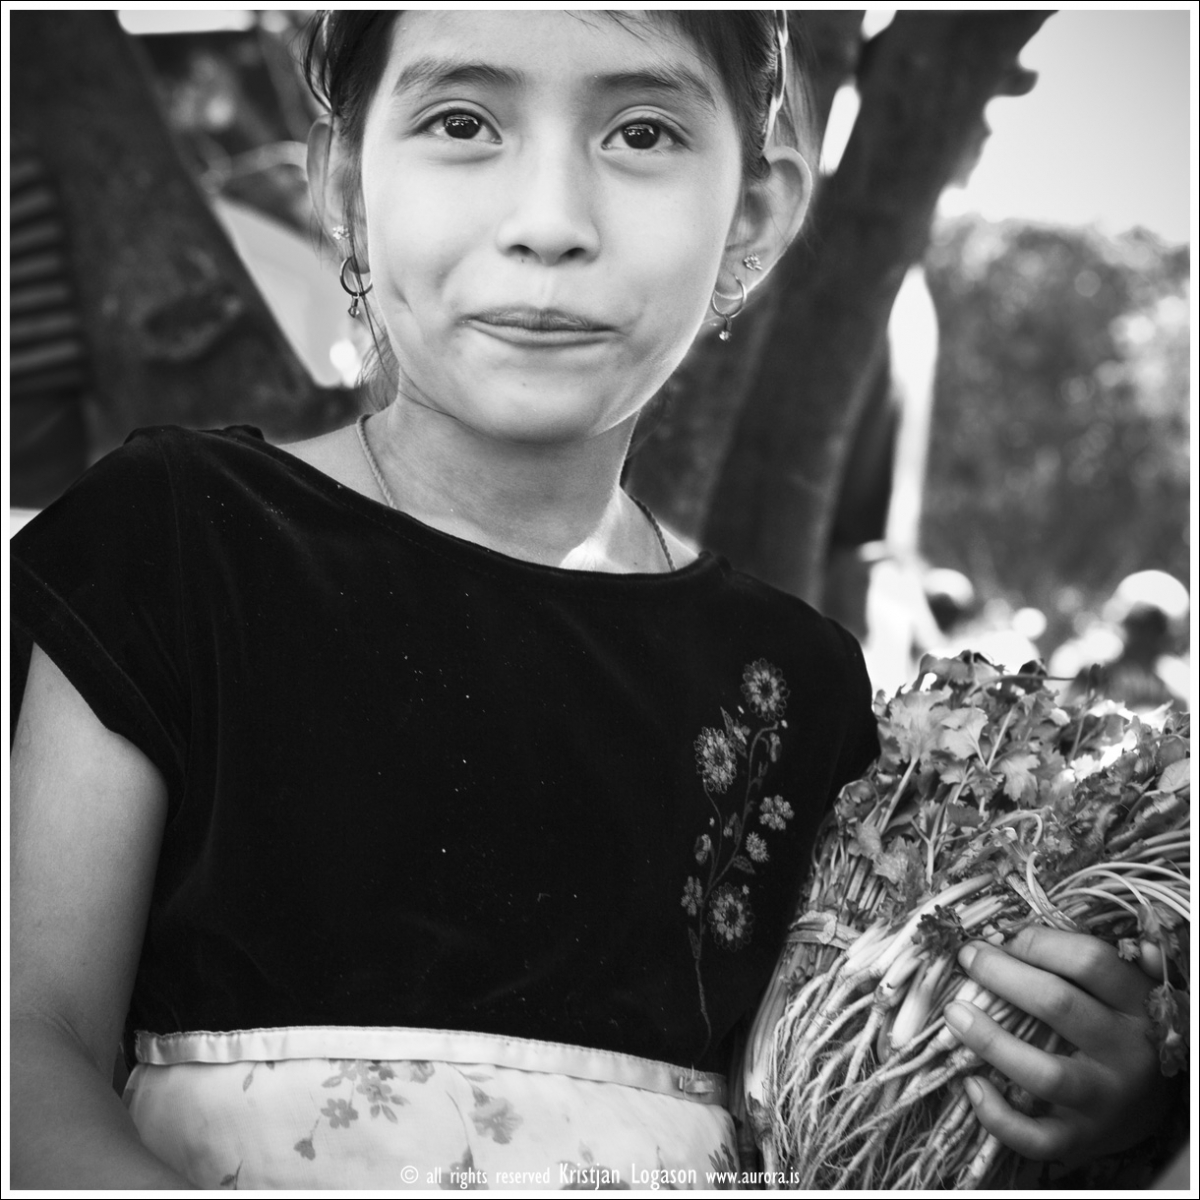 Young girl selling spice at the fiesta gastronomica in Juayua, El Salvador